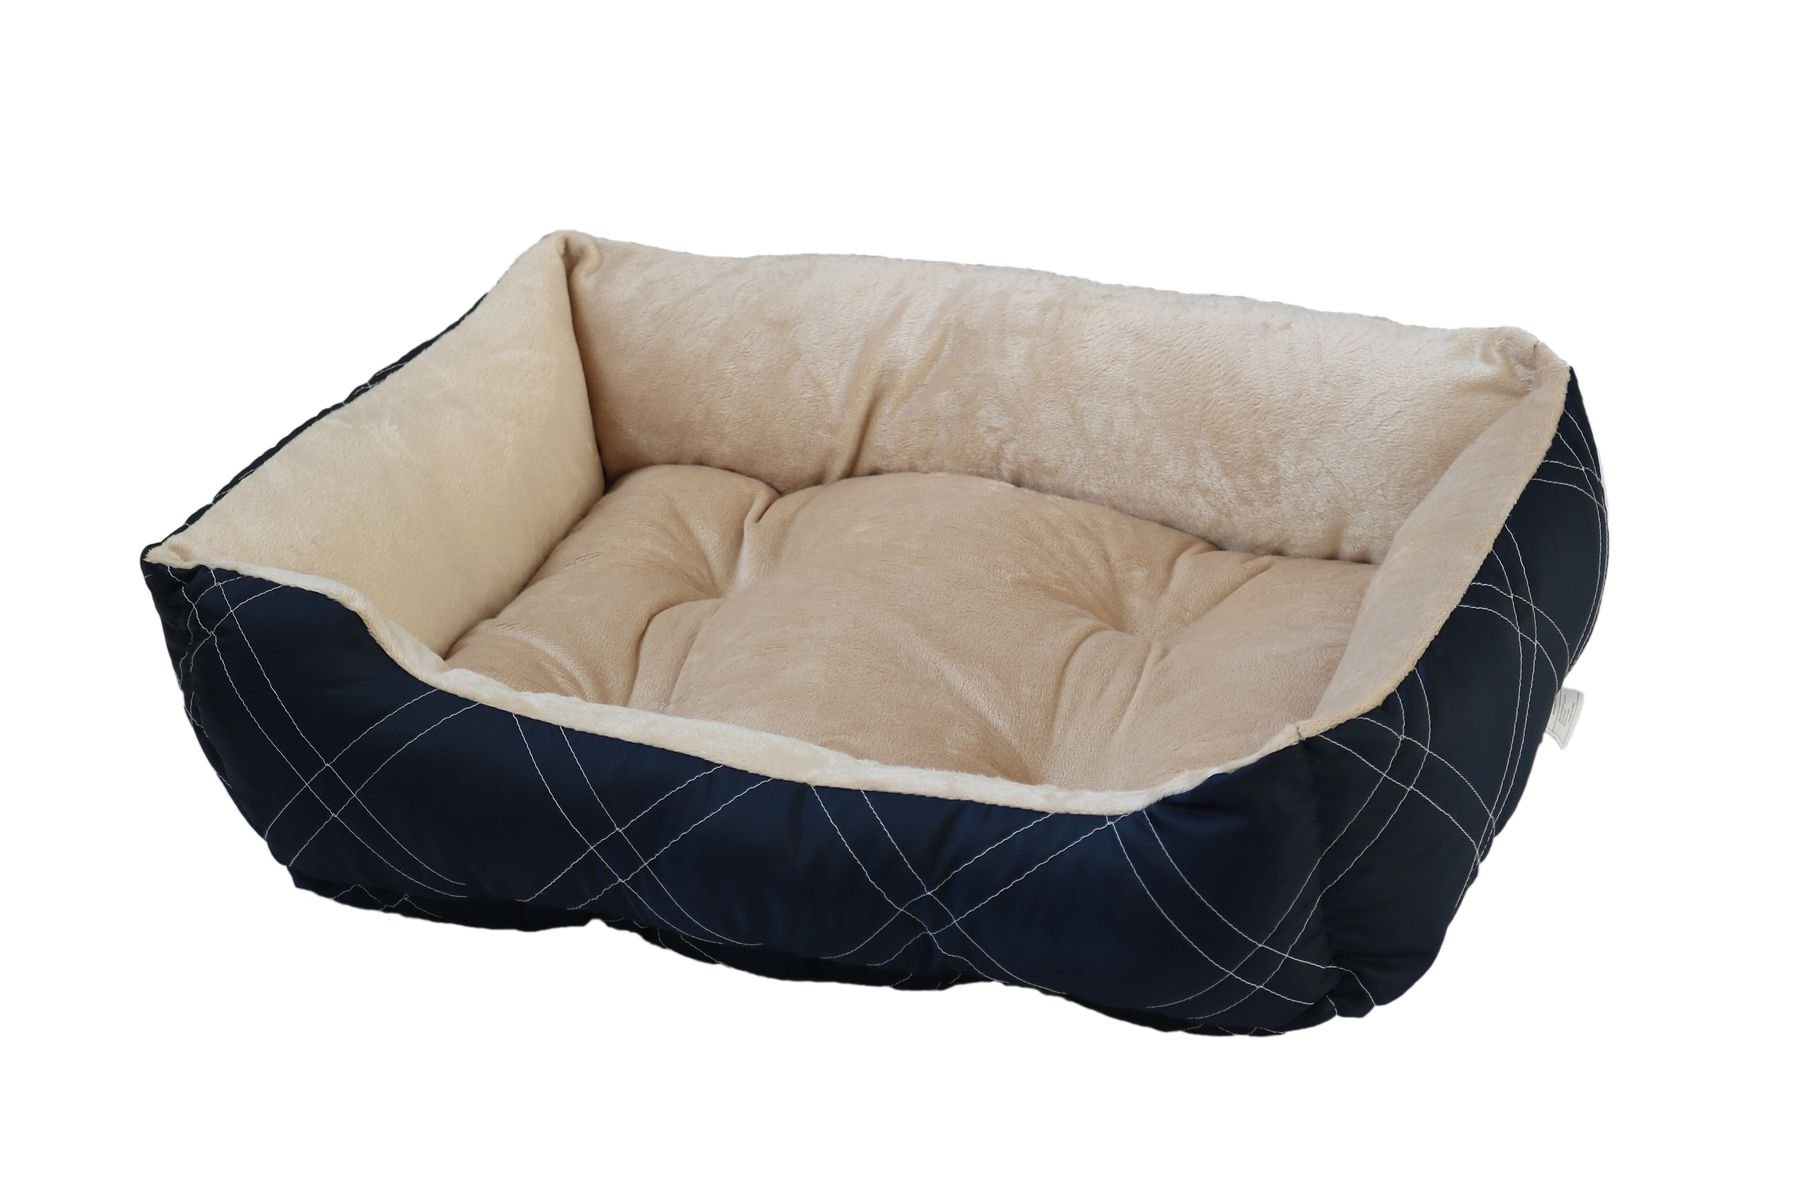 HappyCare Textiles HCT-REC-005 Diamond Quilted Reversible Bed/Cuddler, Medium Size, Navy Pet Habitat Bedding